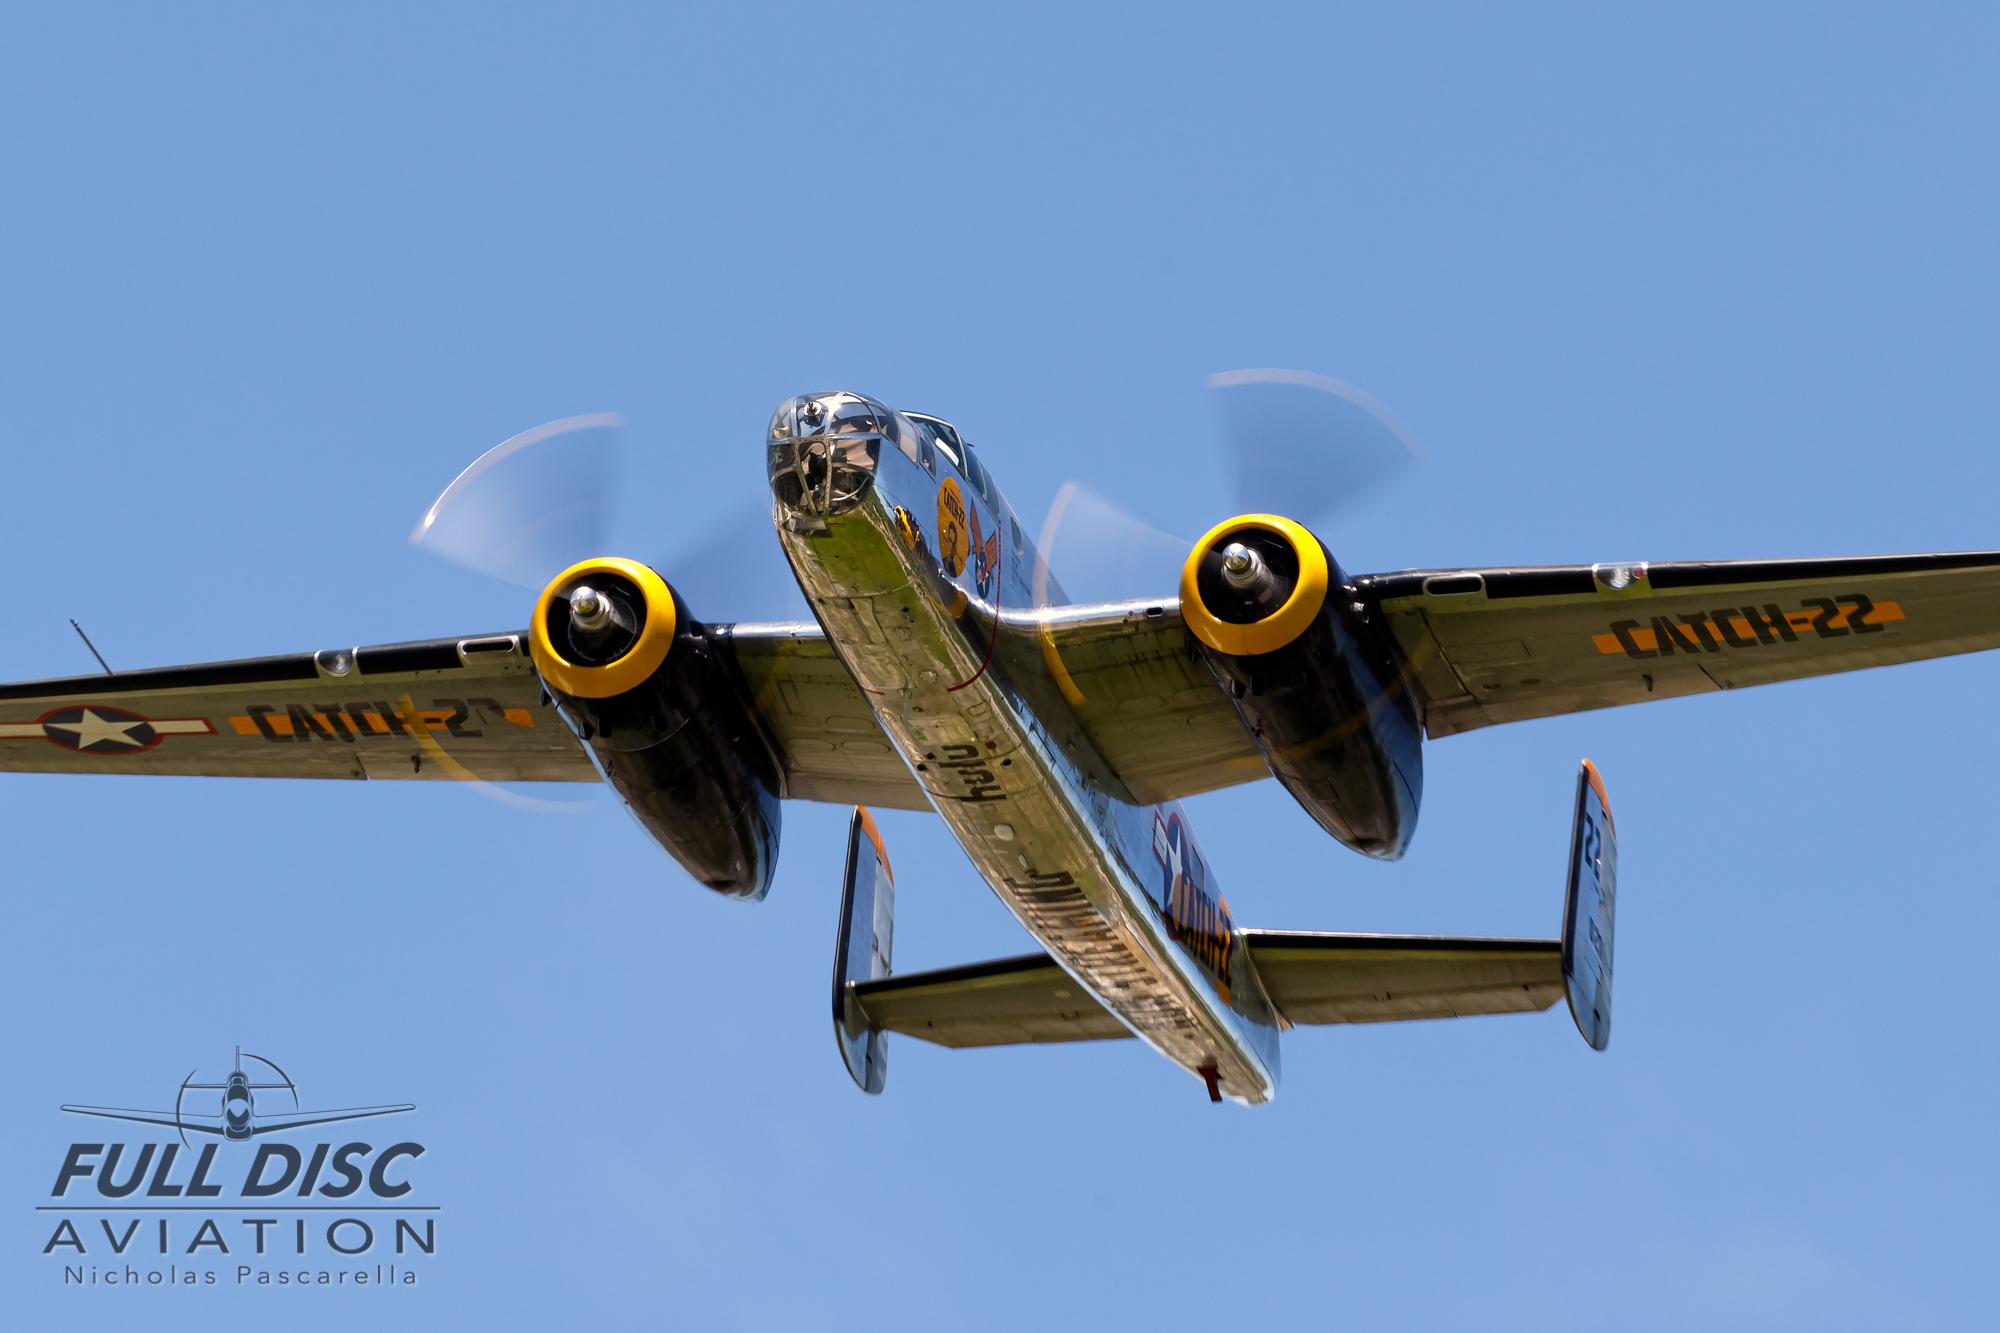 americanairpowermuseum_nicholaspascarella_nickpascarella_fulldiscaviation_legendsofairpower2019_aviation_warbird_b25_catch22_b25mitchelbomber.jpg